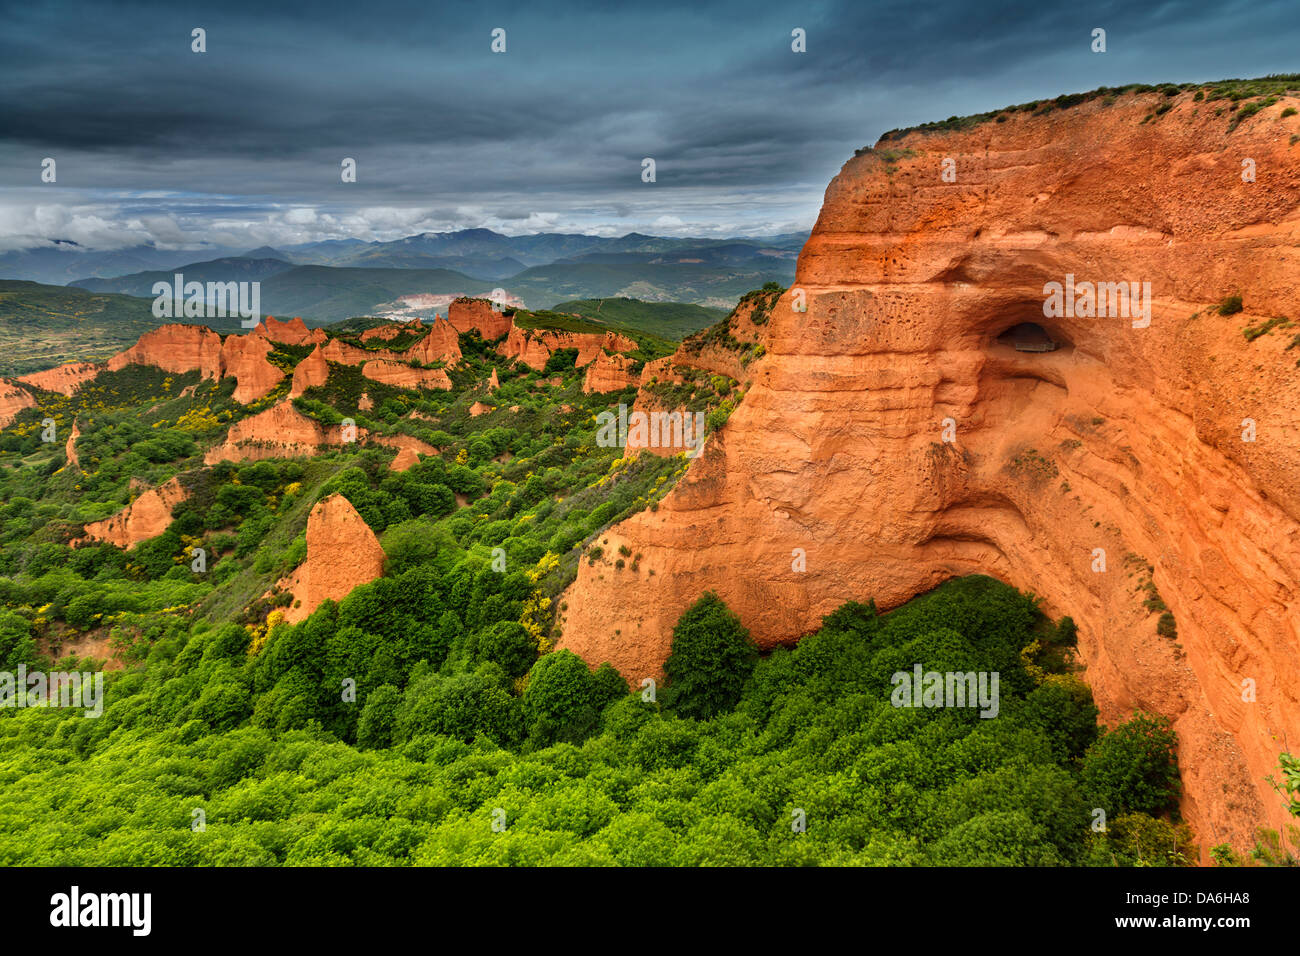 Nature landscape Las Médulas Roman gold mining World Heritage Site El Bierzo Leon Castilla Spain - Stock Image